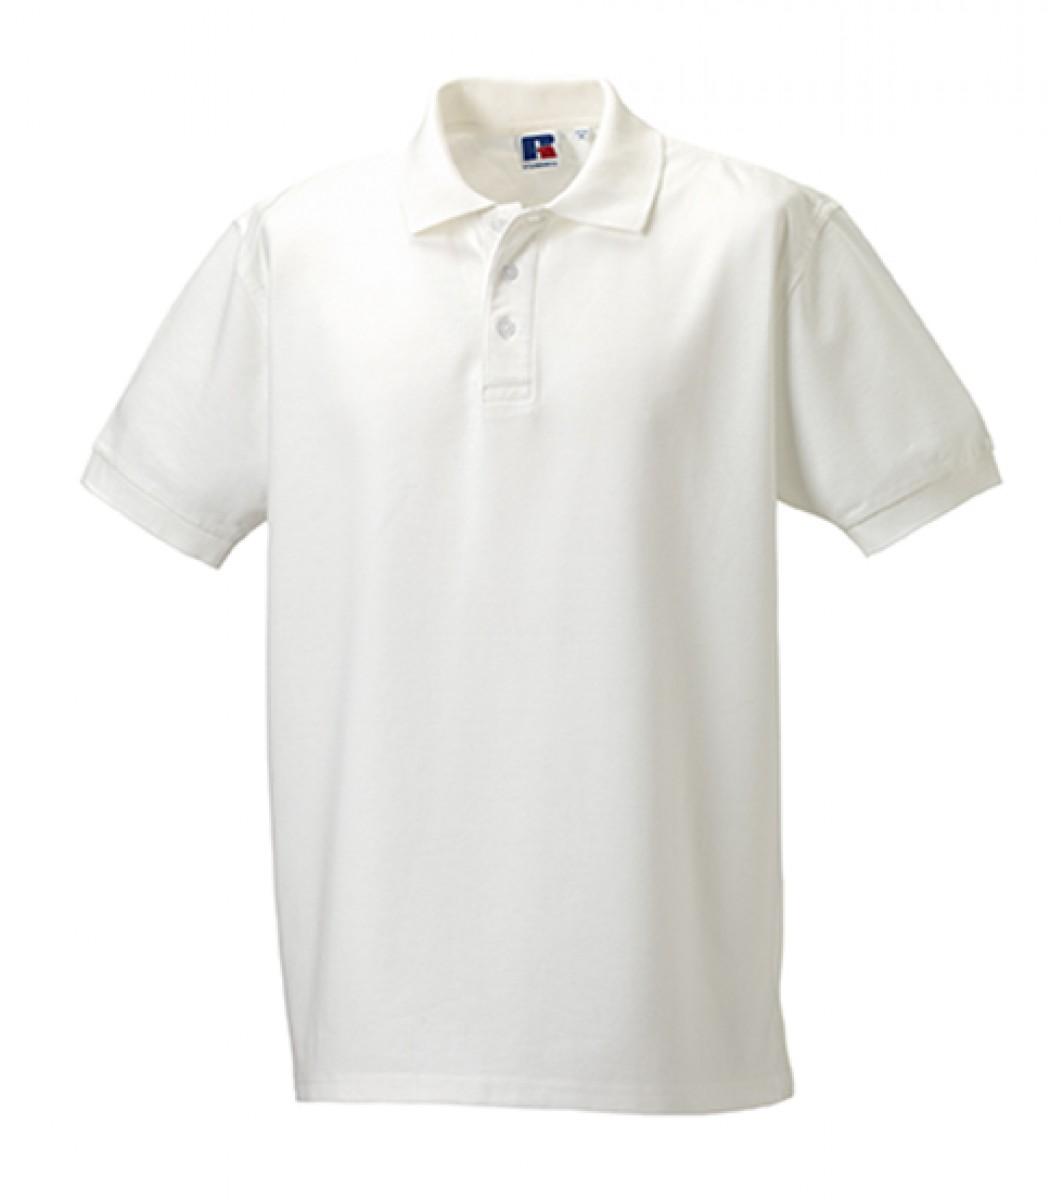 Herren Poloshirt ultimo